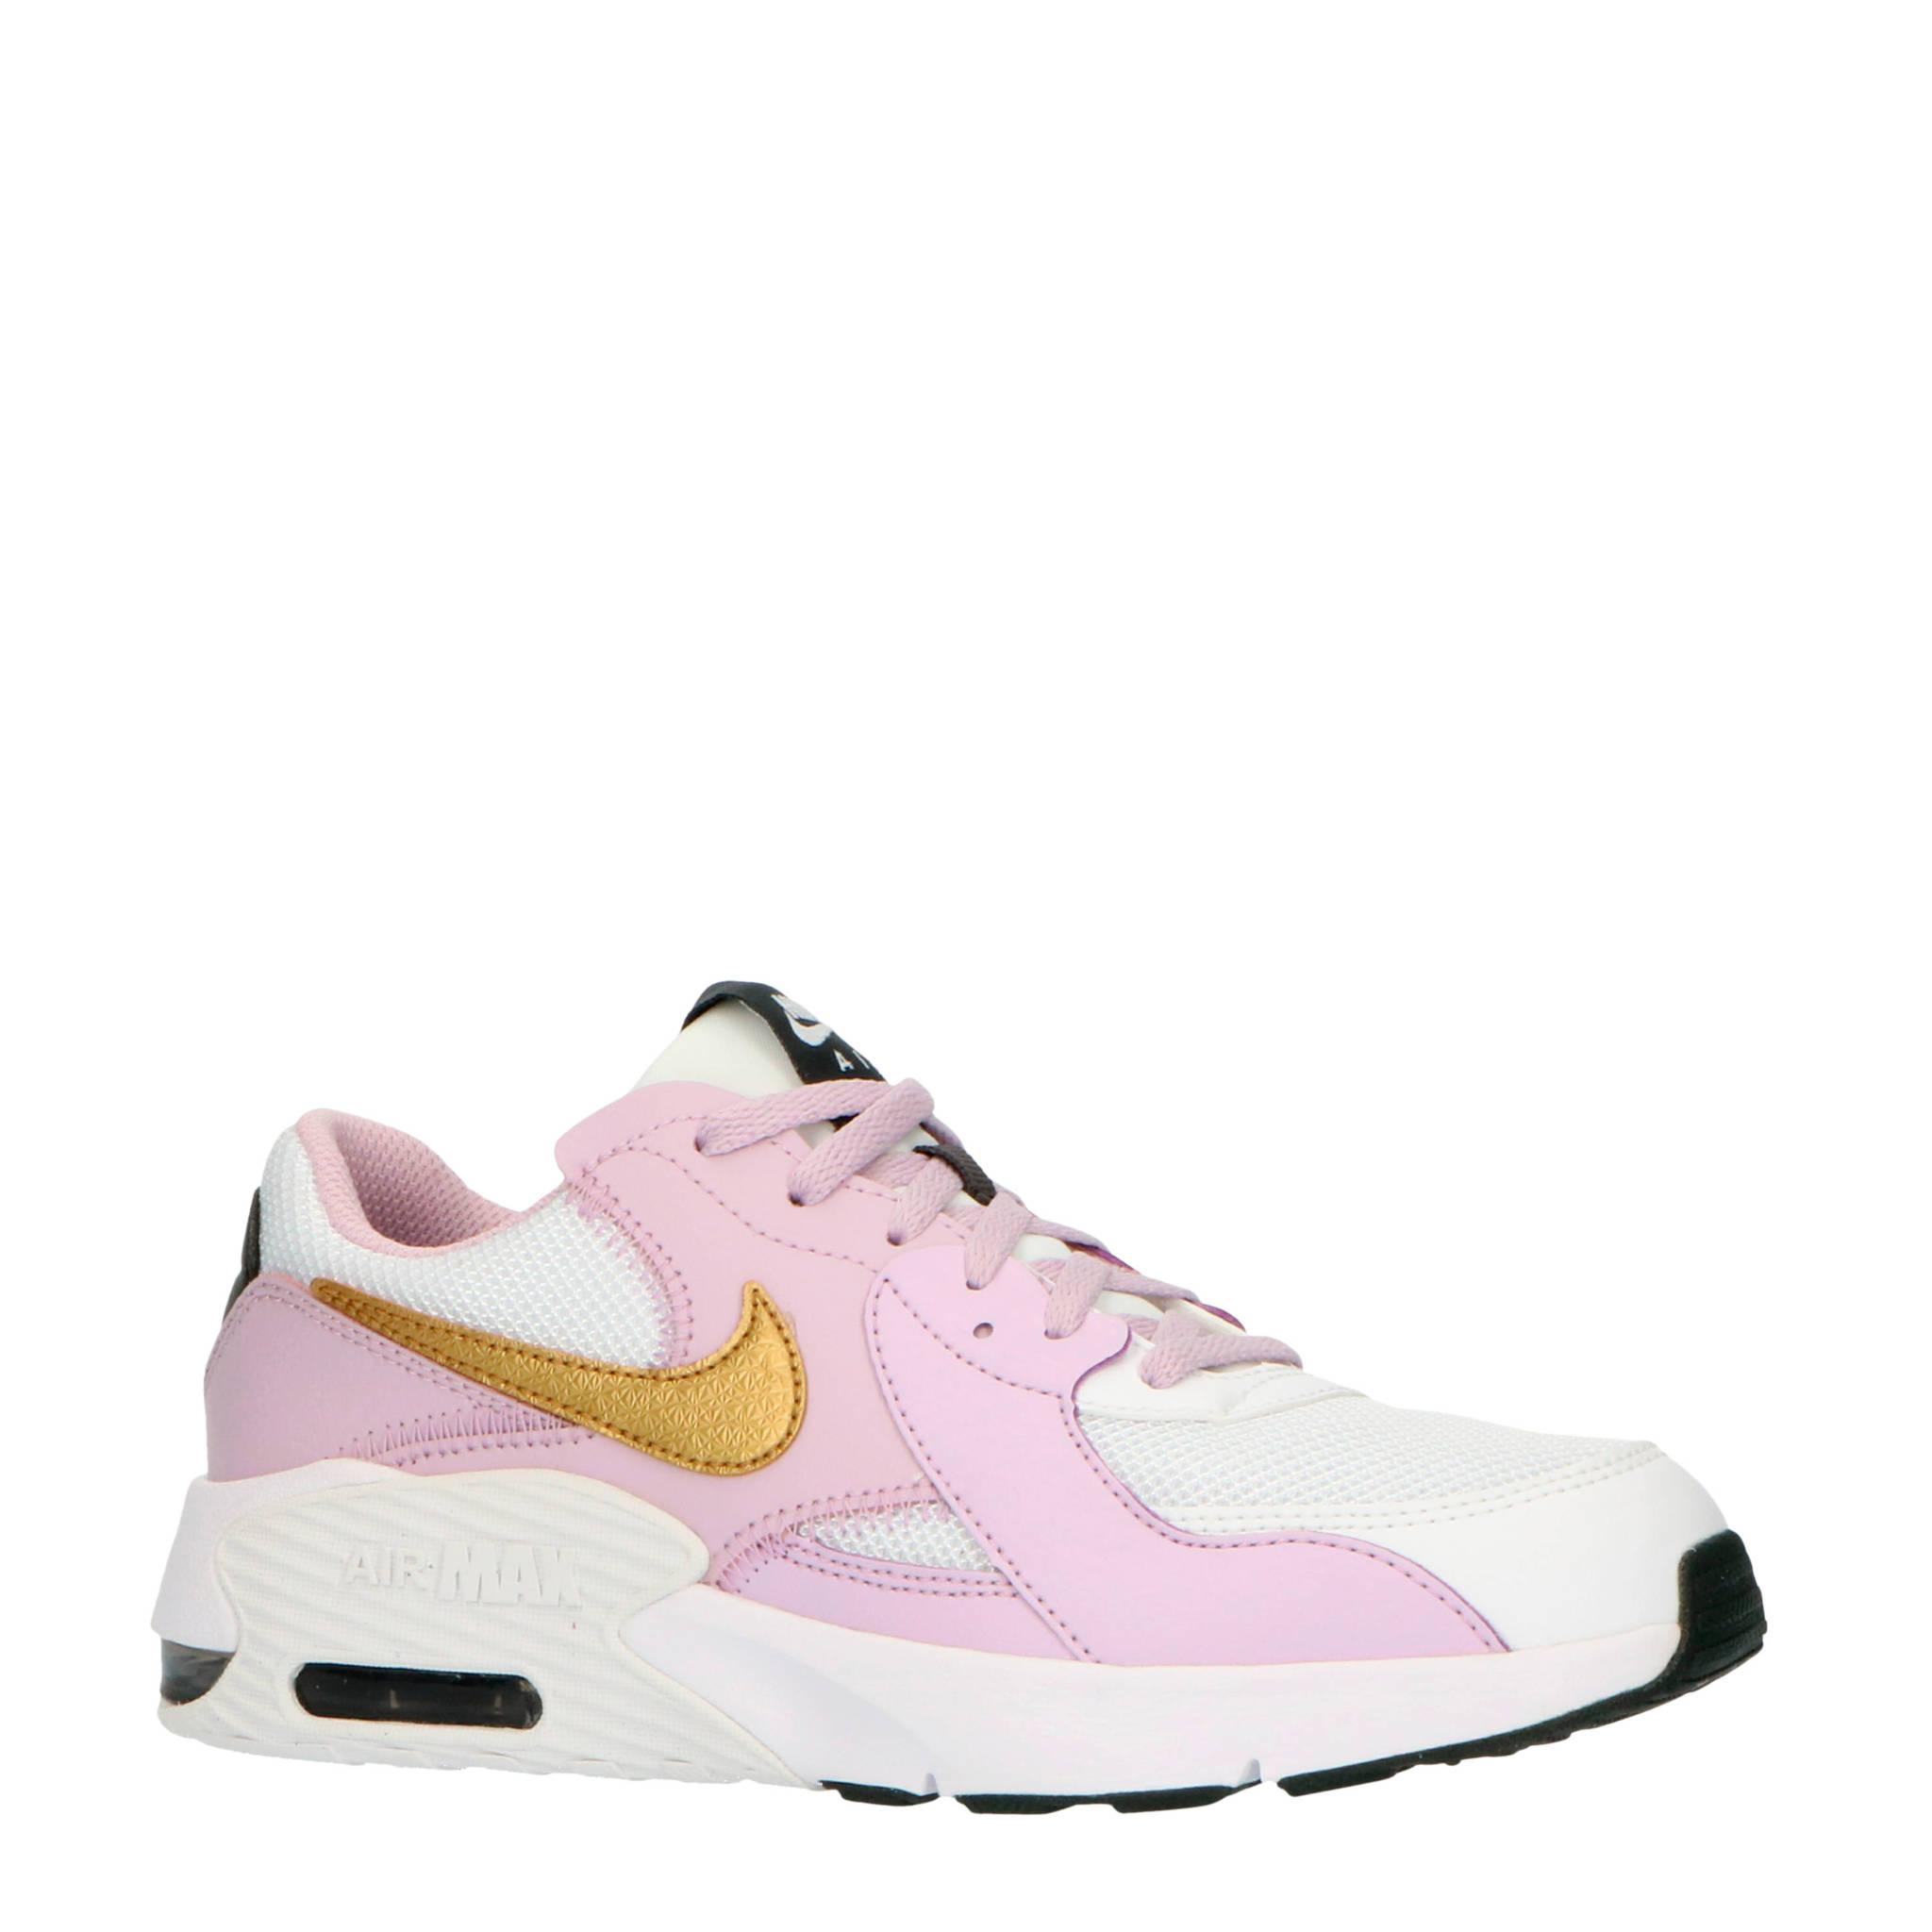 Nike Air Max roze